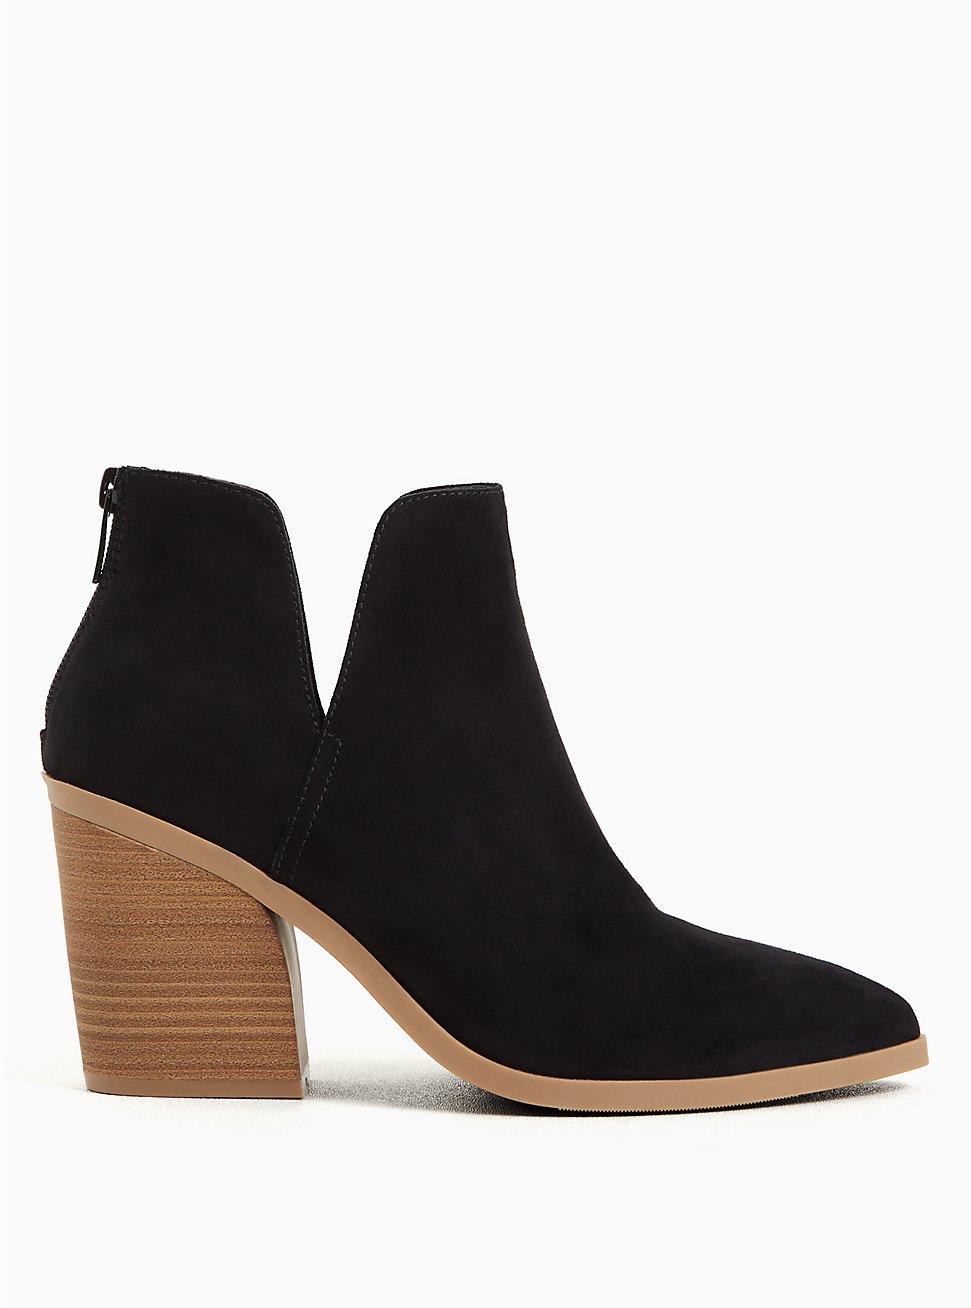 Black Faux Suede Pointed Toe V-Cut Bootie (WW), BLACK, hi-res